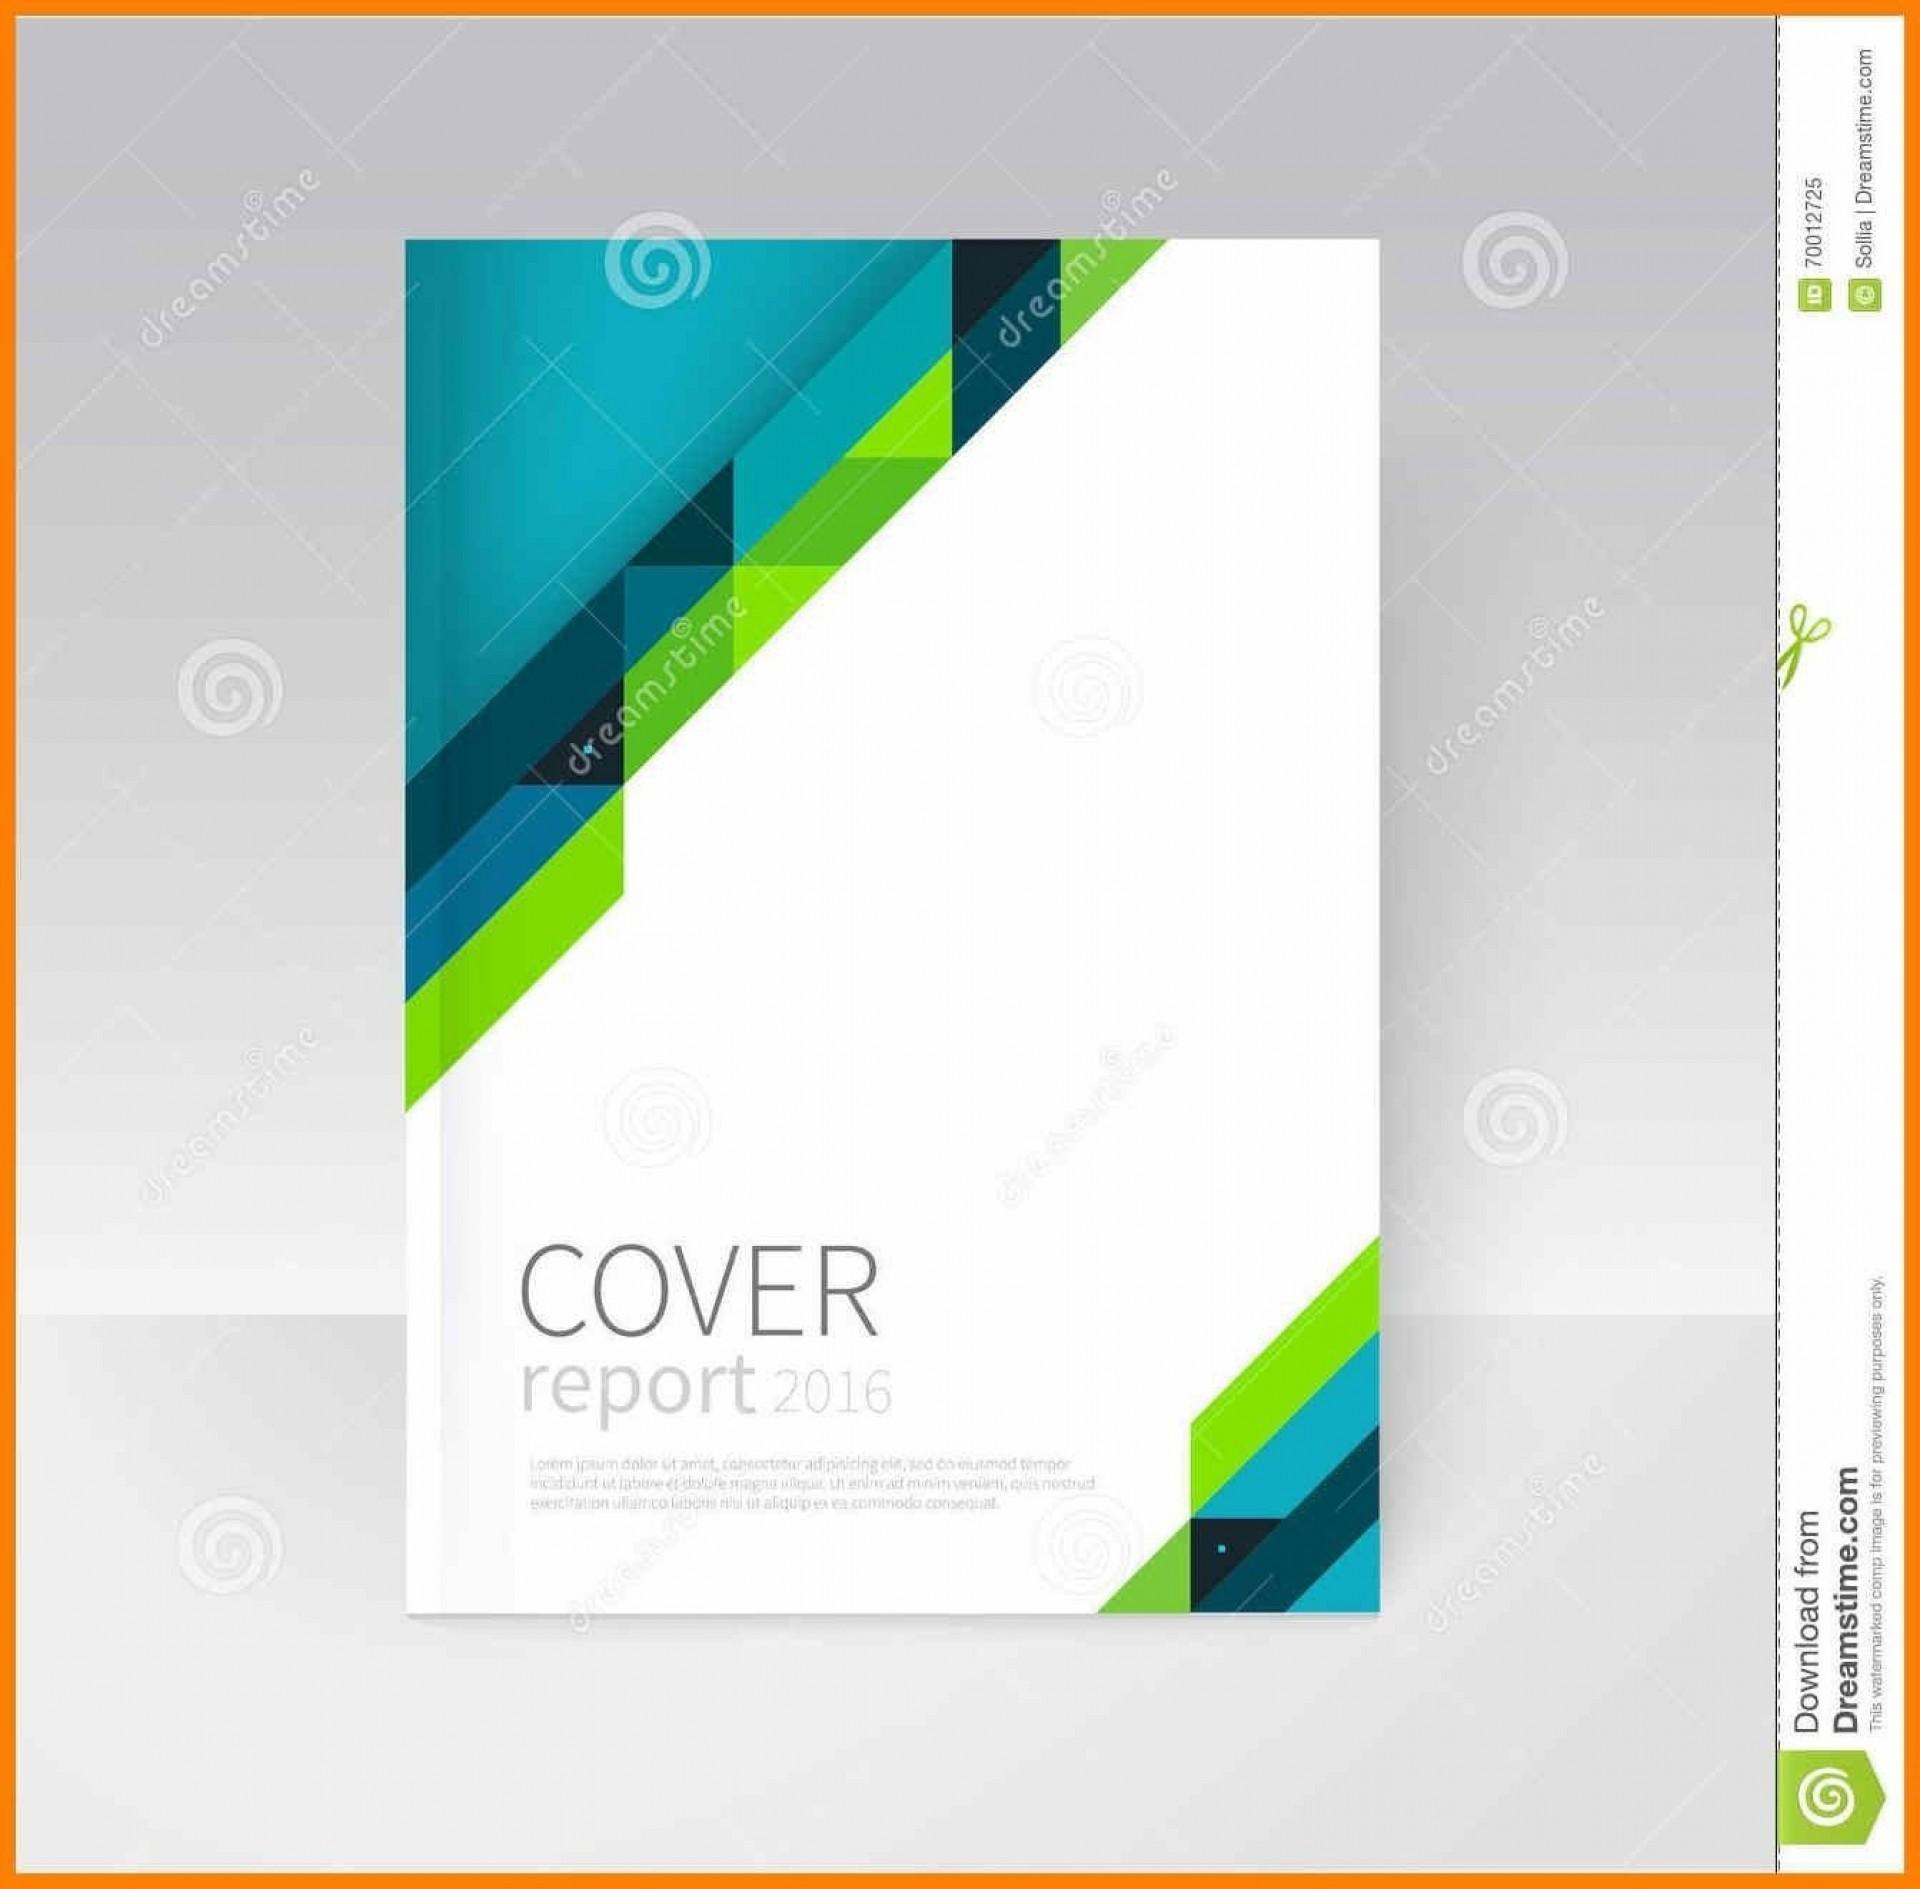 000 Fascinating Microsoft Word Template Download High Resolution  M Cv Free Header1920